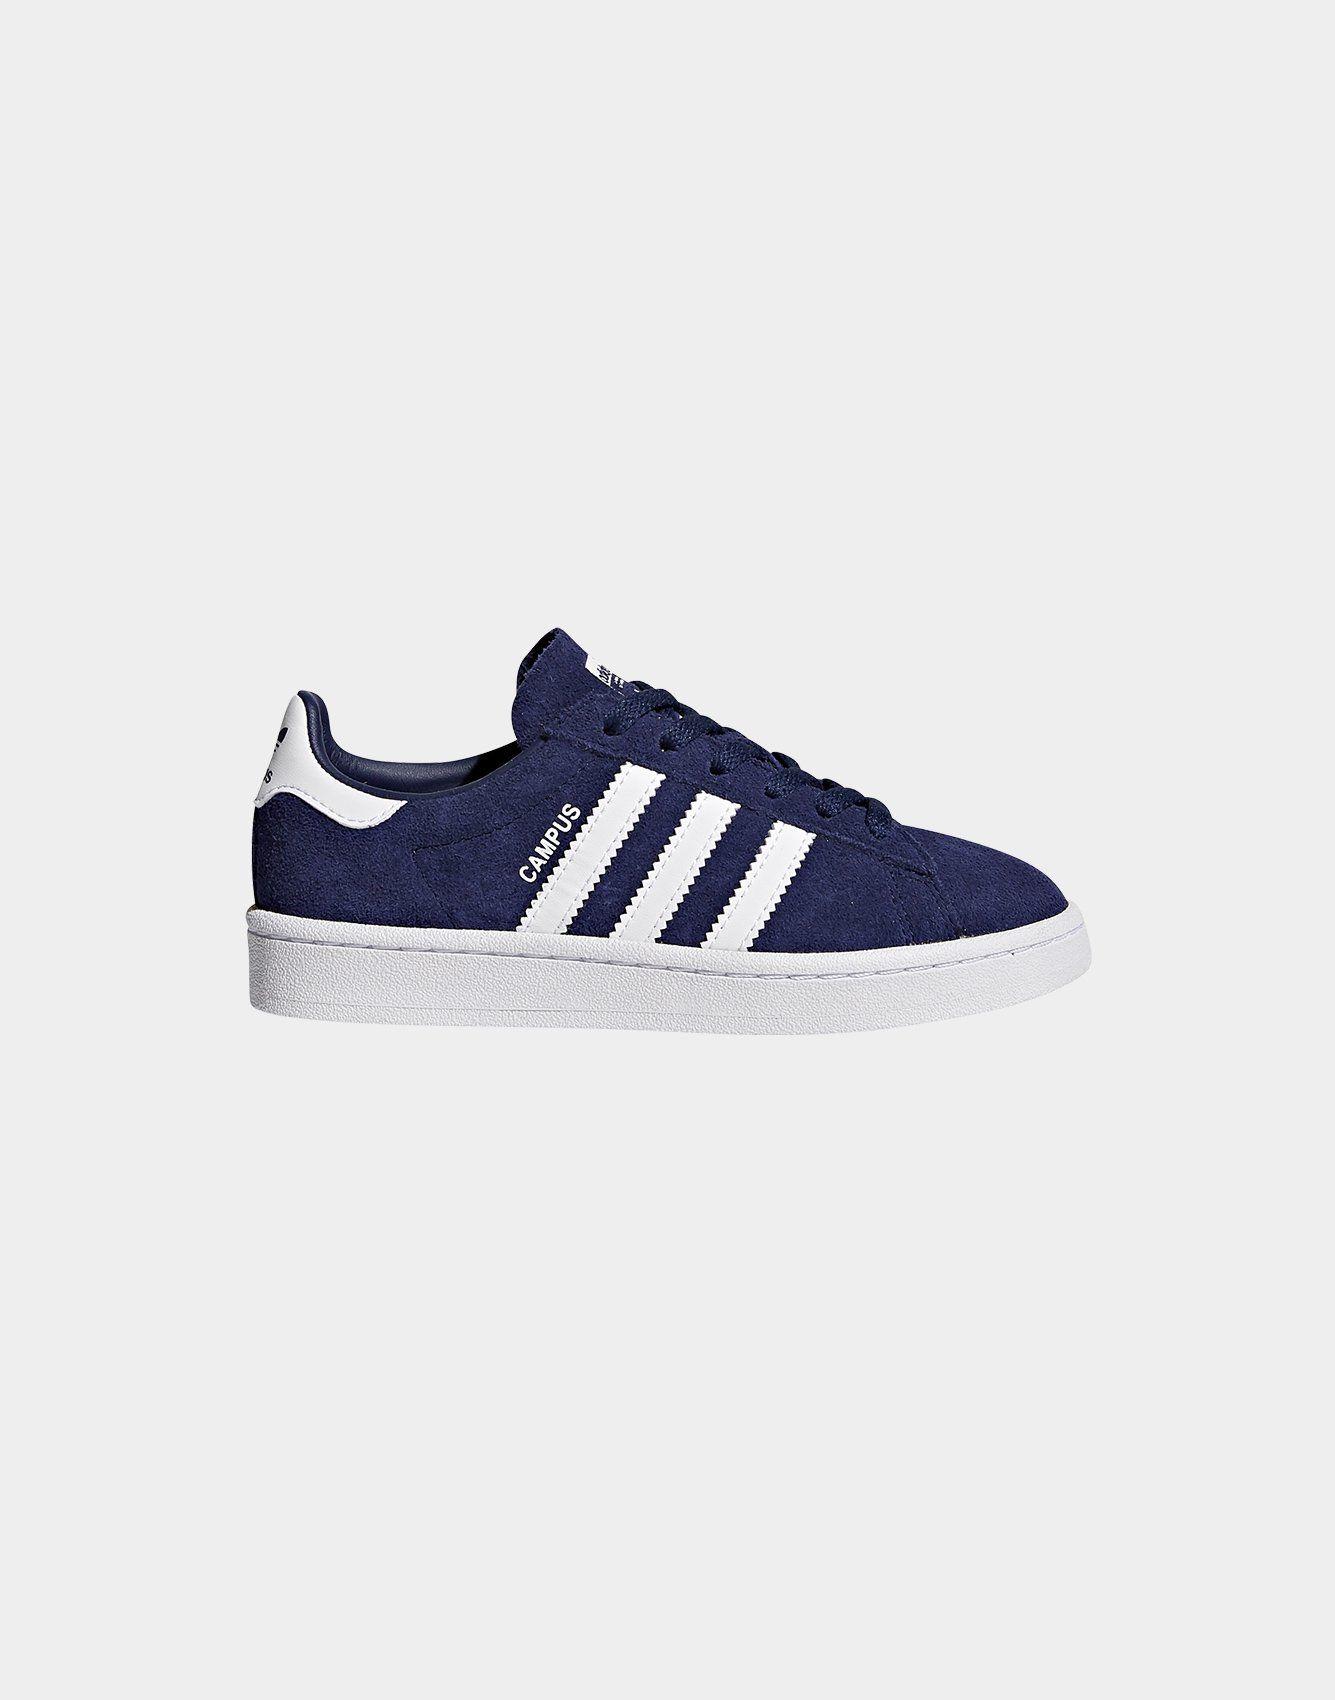 fd11963cf57 ADIDAS   CAMPUS KIDS SHOES   eins.   Adidas sneakers, Adidas und ...